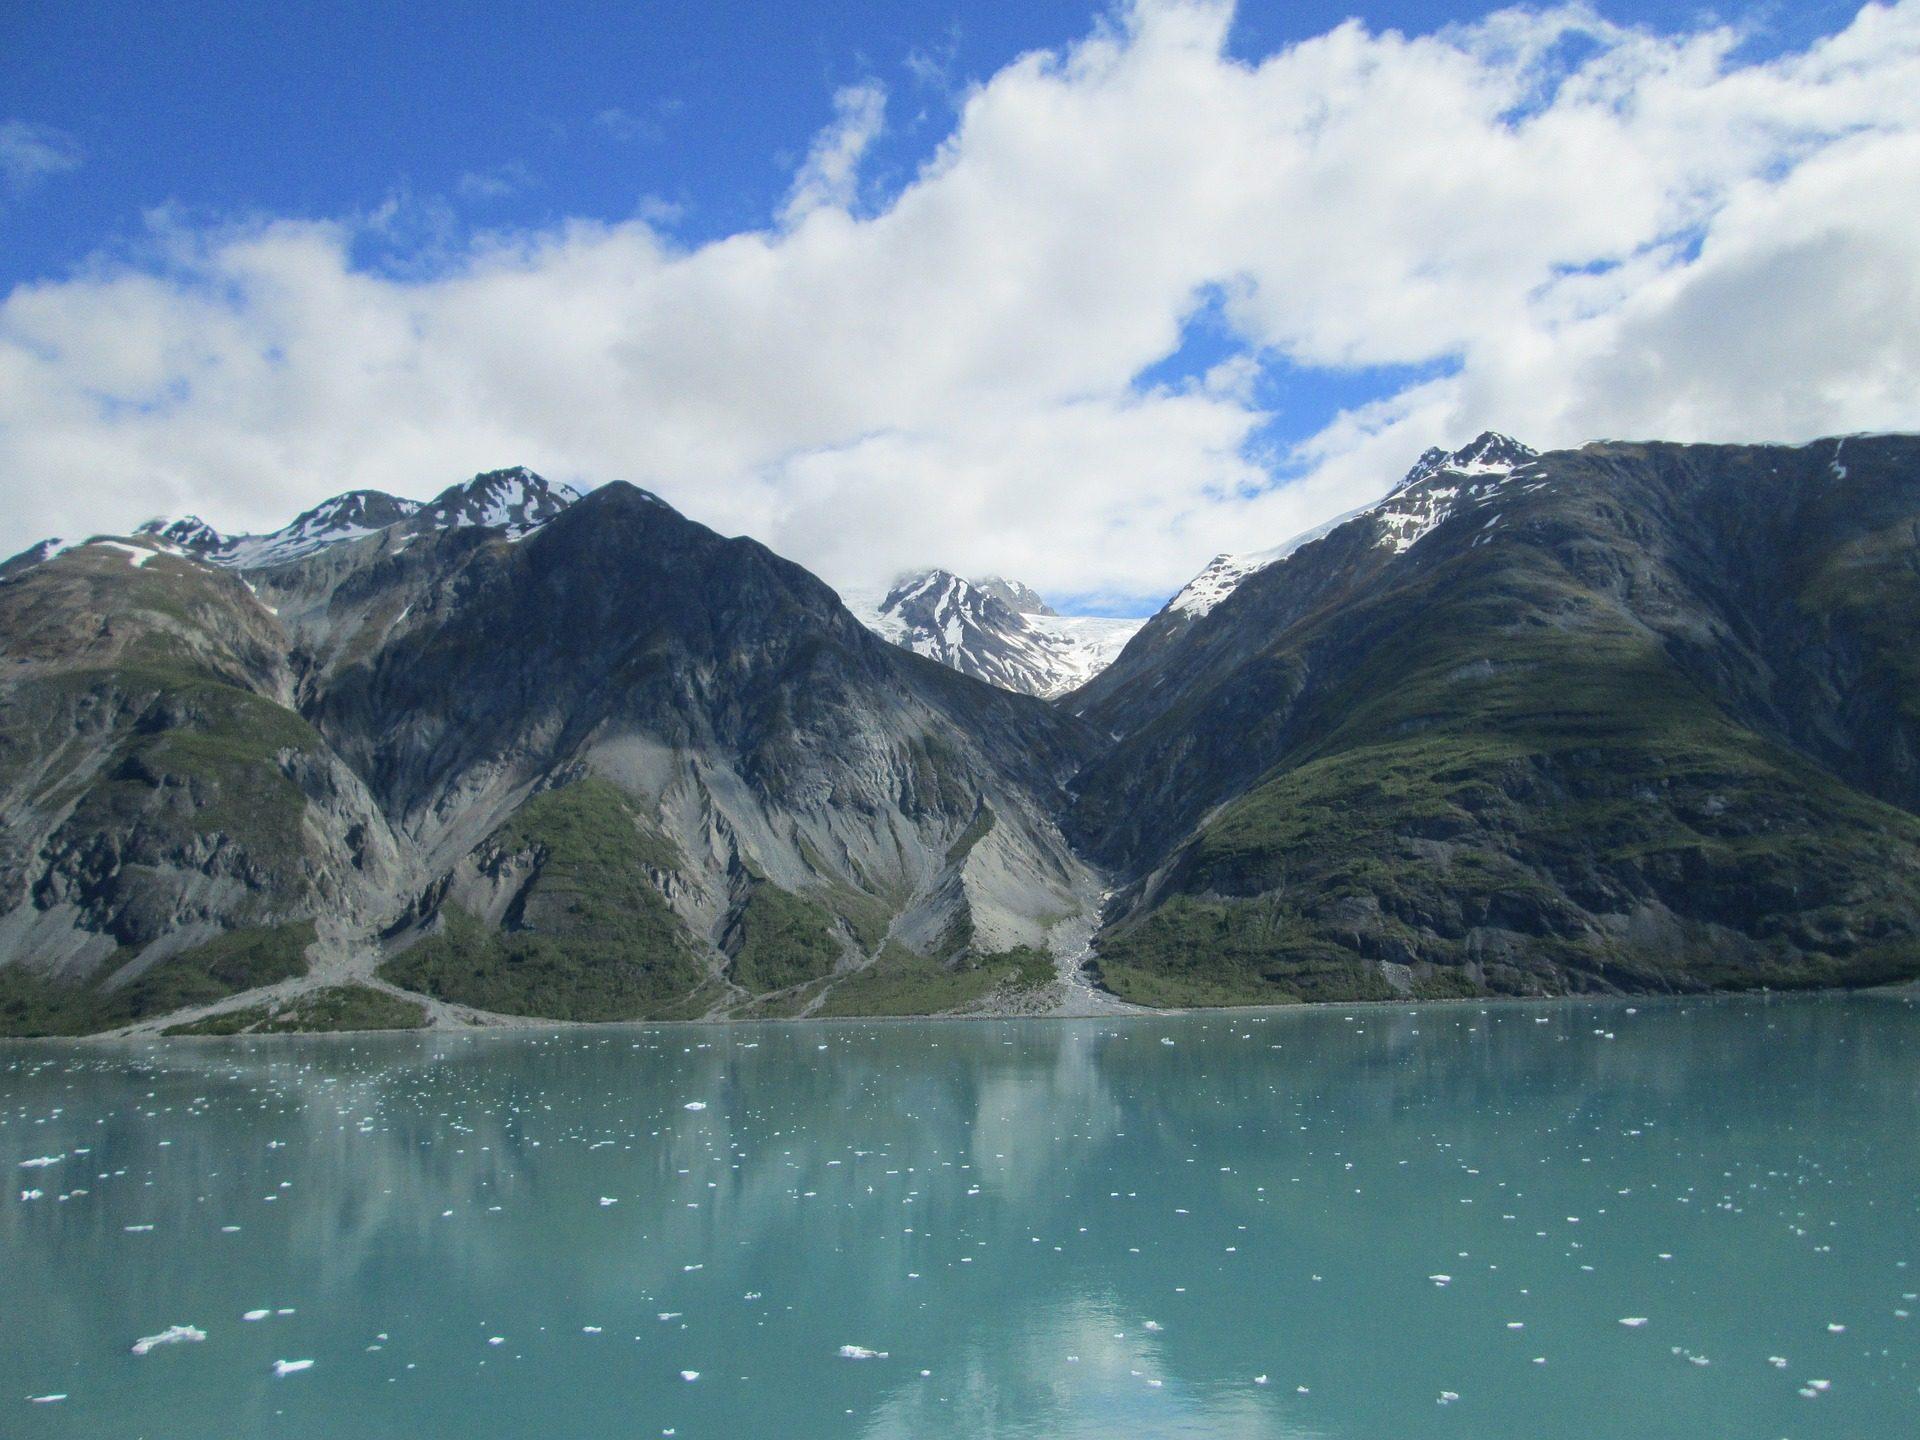 Montañas, neige, Mer, Océan, Pizza, Alaska - Fonds d'écran HD - Professor-falken.com